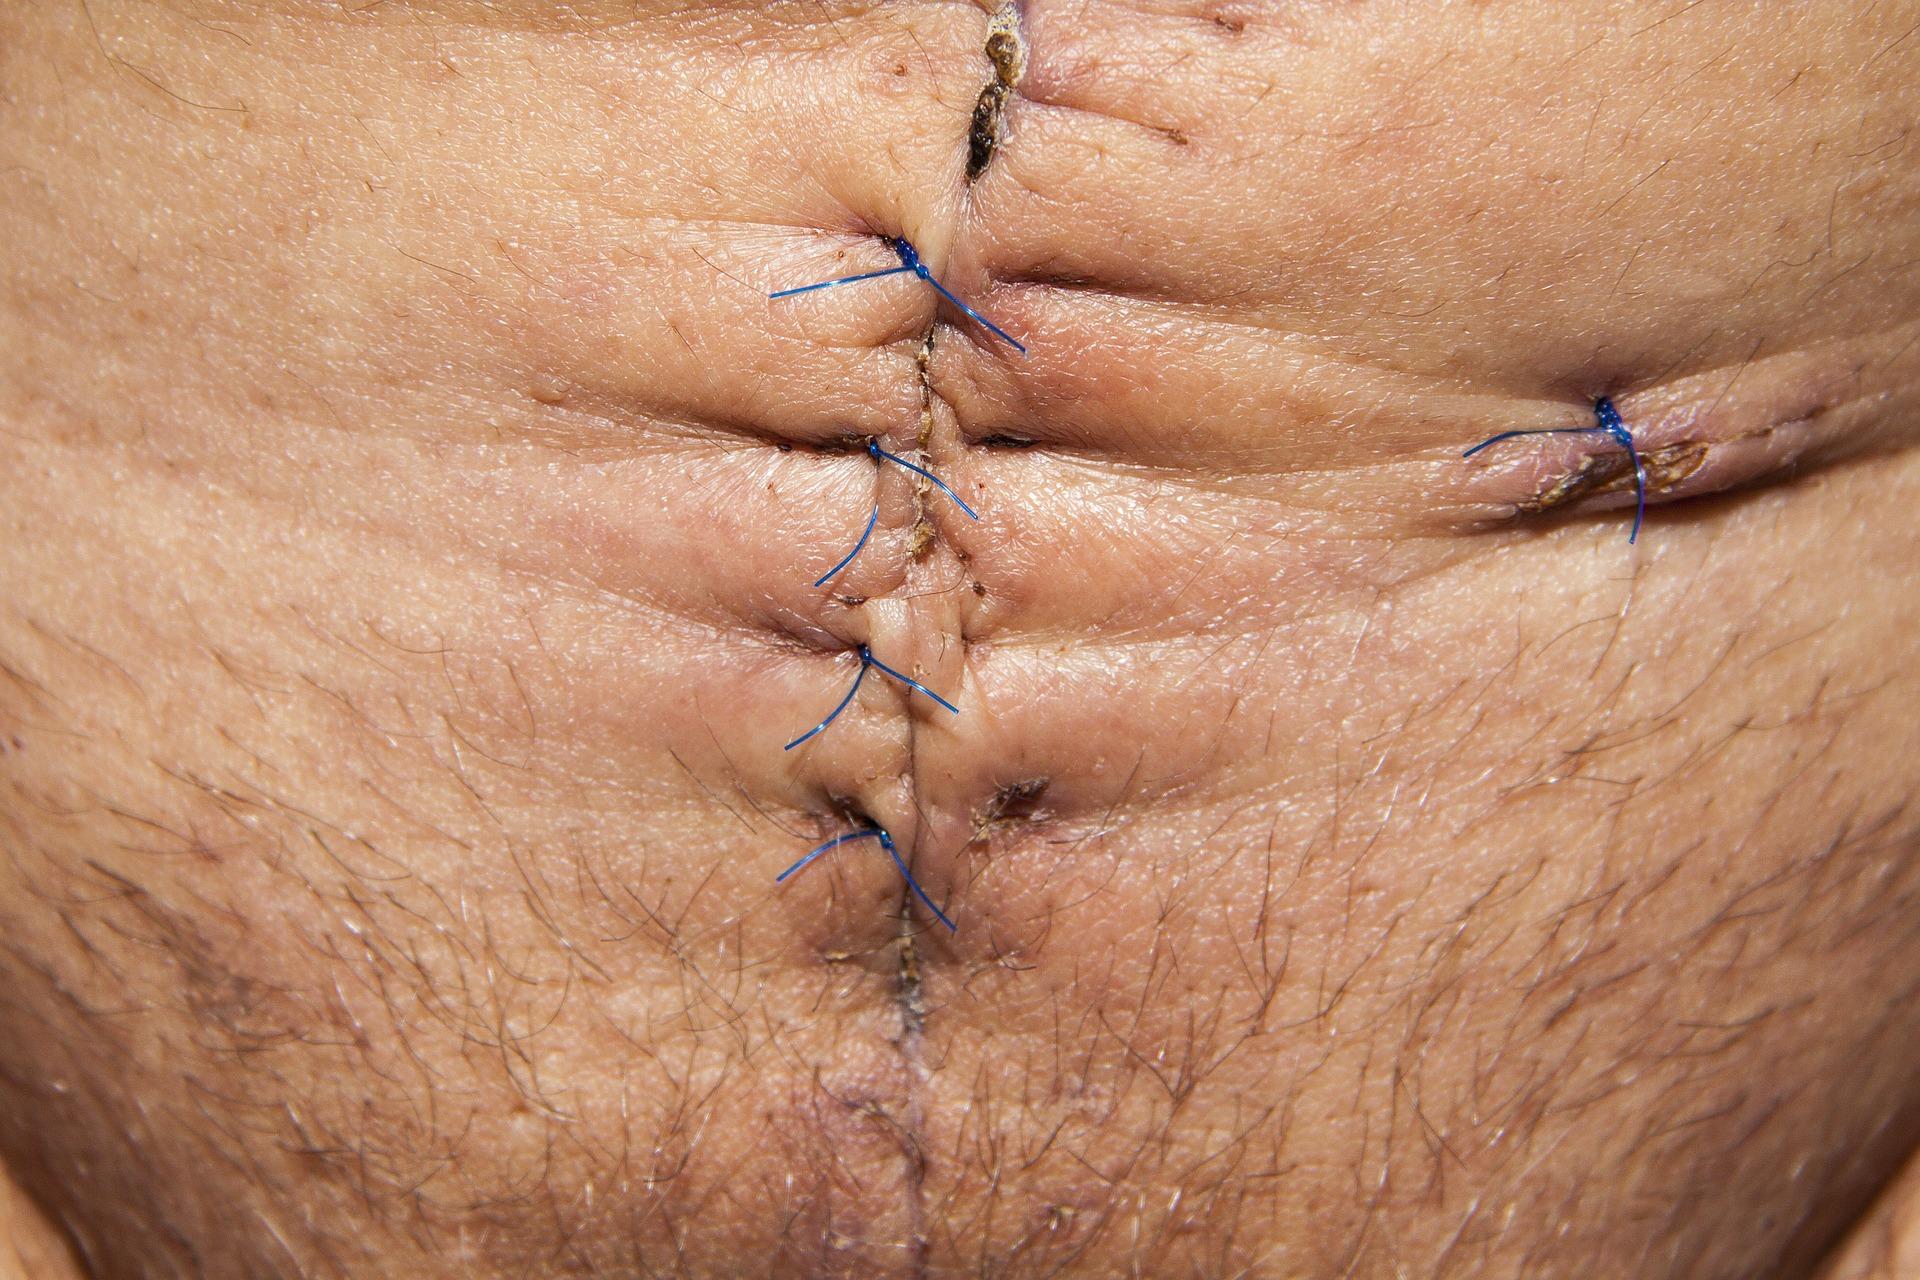 Stitched Stomach, Doctors, Health, Hospital, Human, HQ Photo